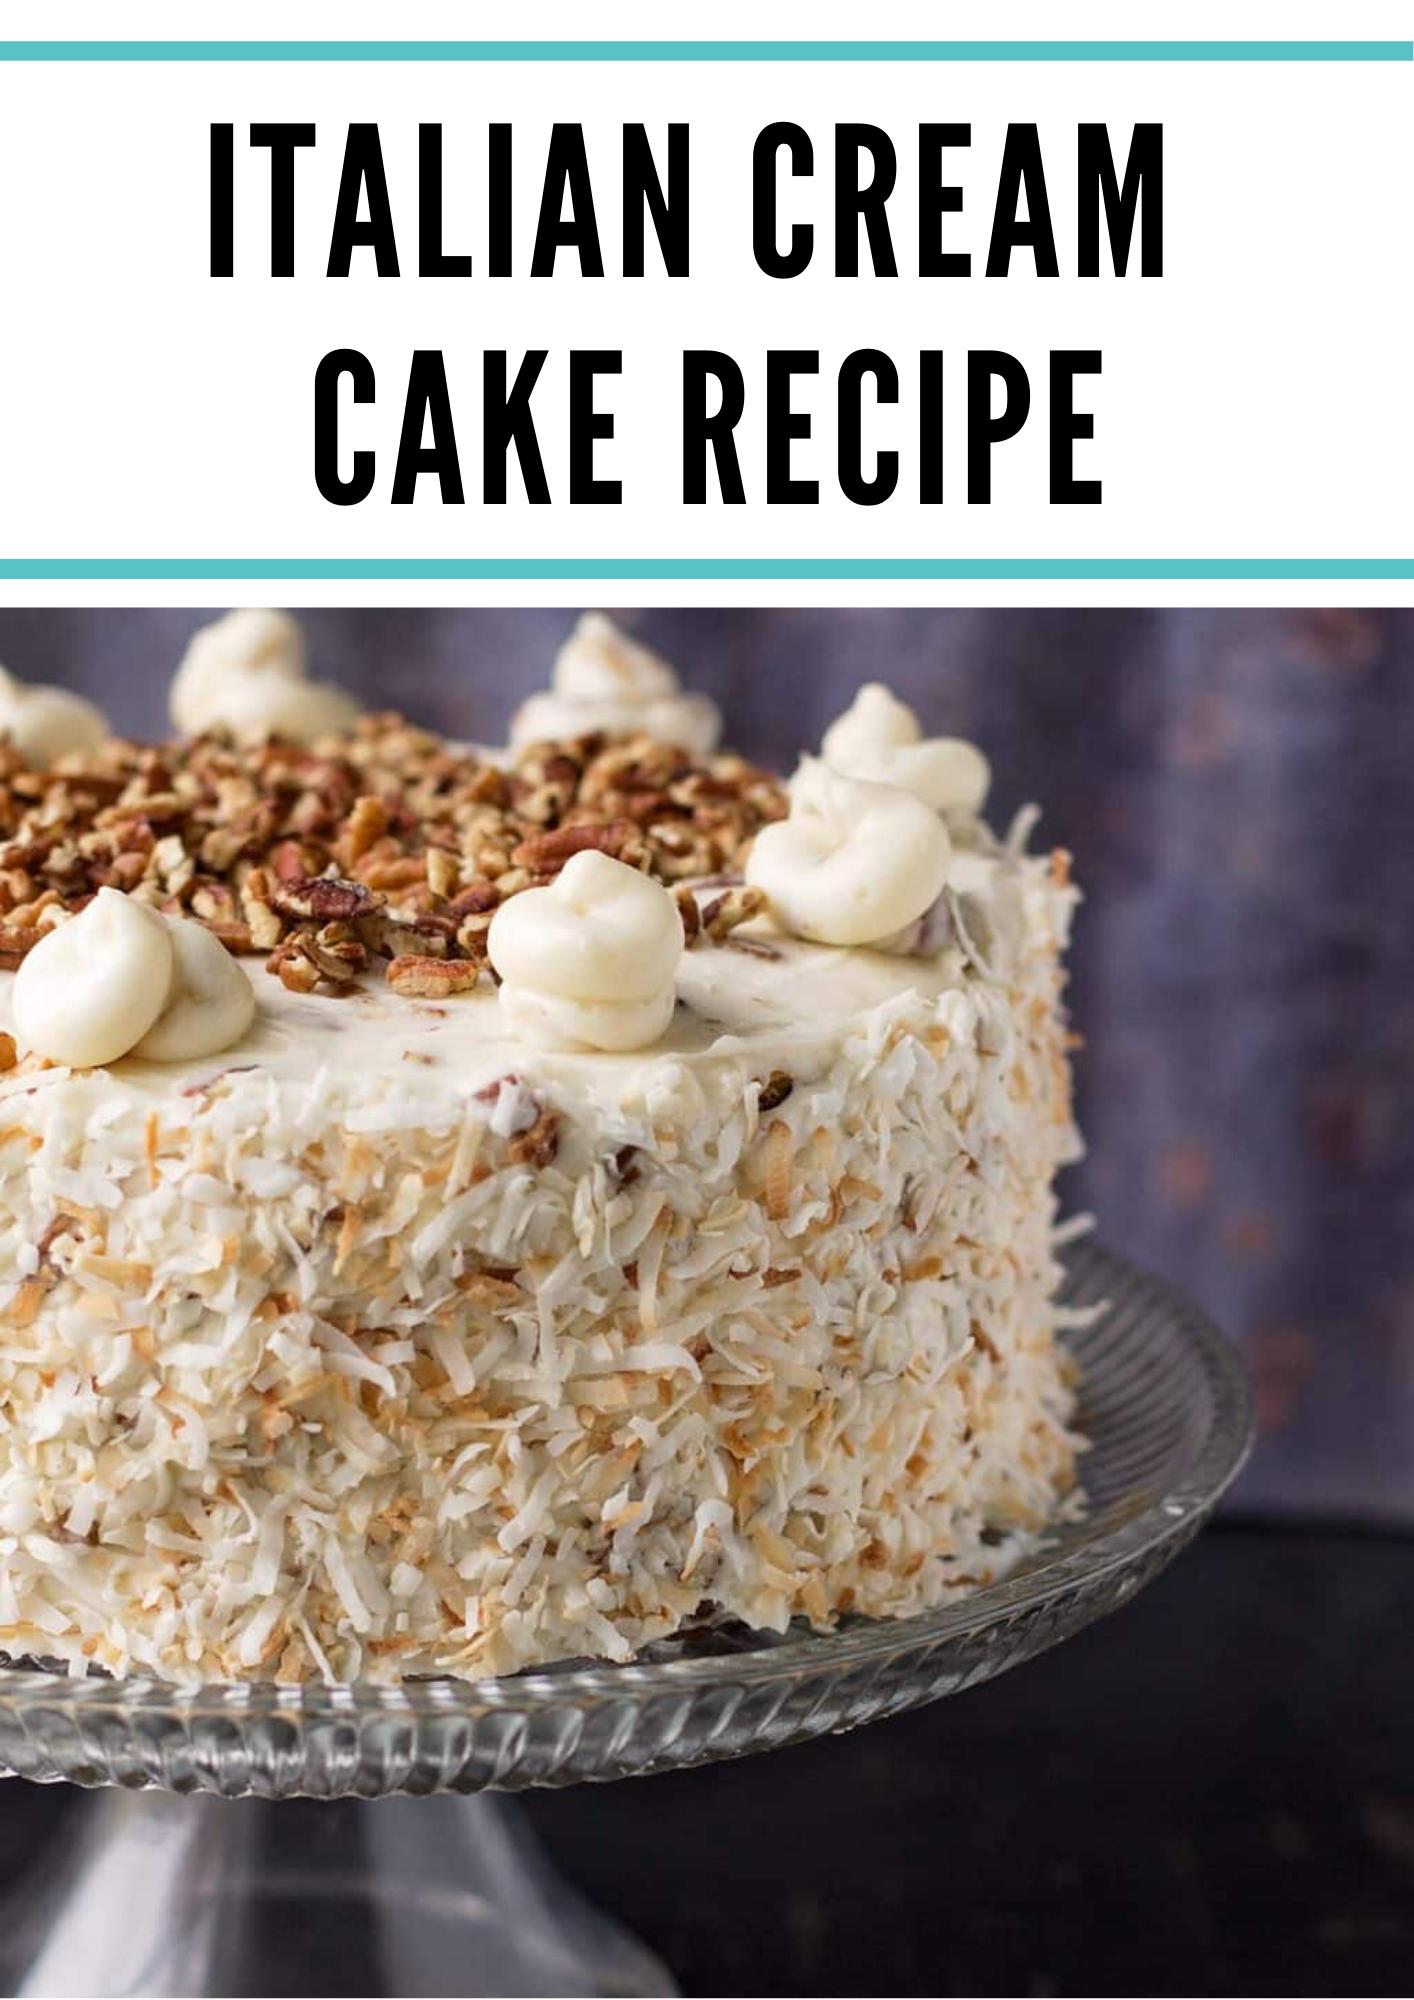 Italian Cream Cake Recipe In 2020 Cake Recipe With Sour Cream Cake Recipes Easy Homemade Sour Cream Recipes